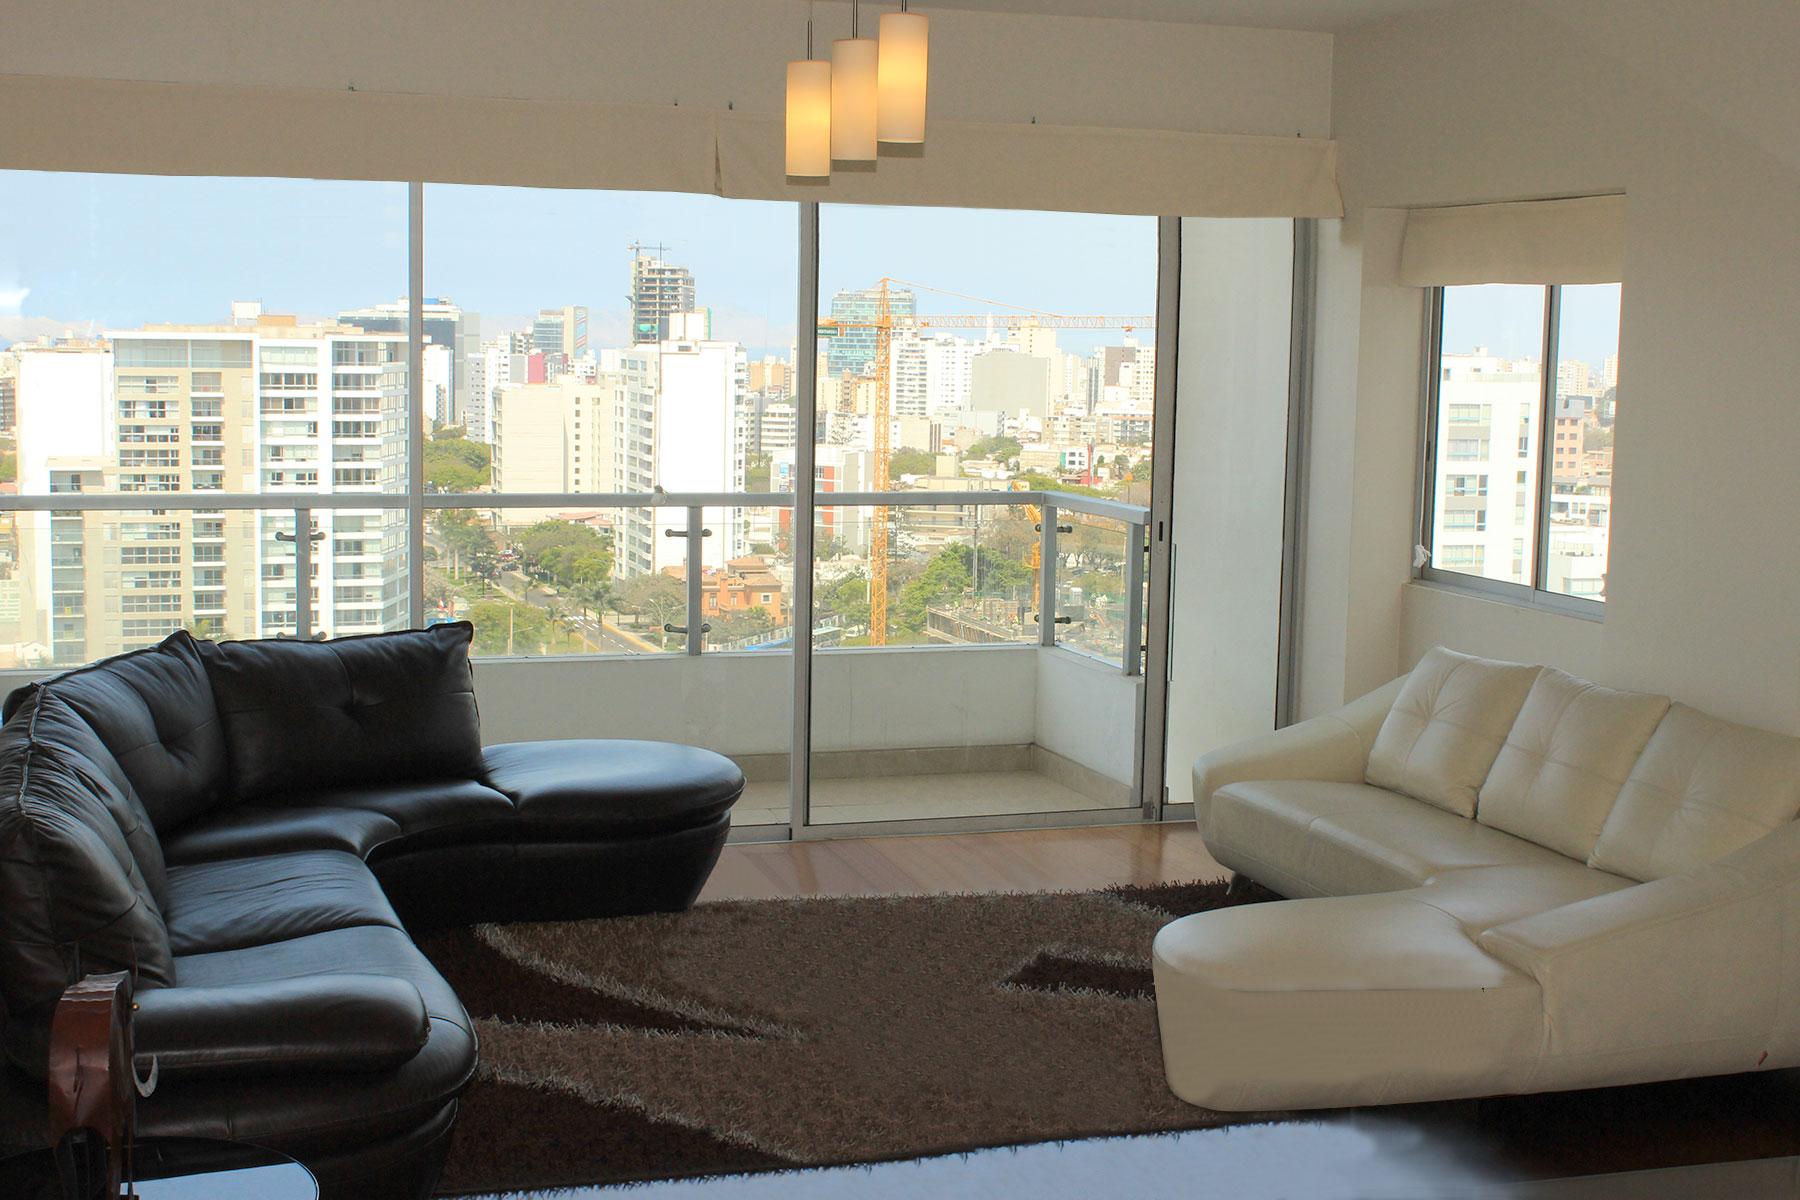 Apartment for Sale at Precioso pent-house duplex frente a parque Calle Los Eucaliptos San Isidro, Lima, 27 Peru